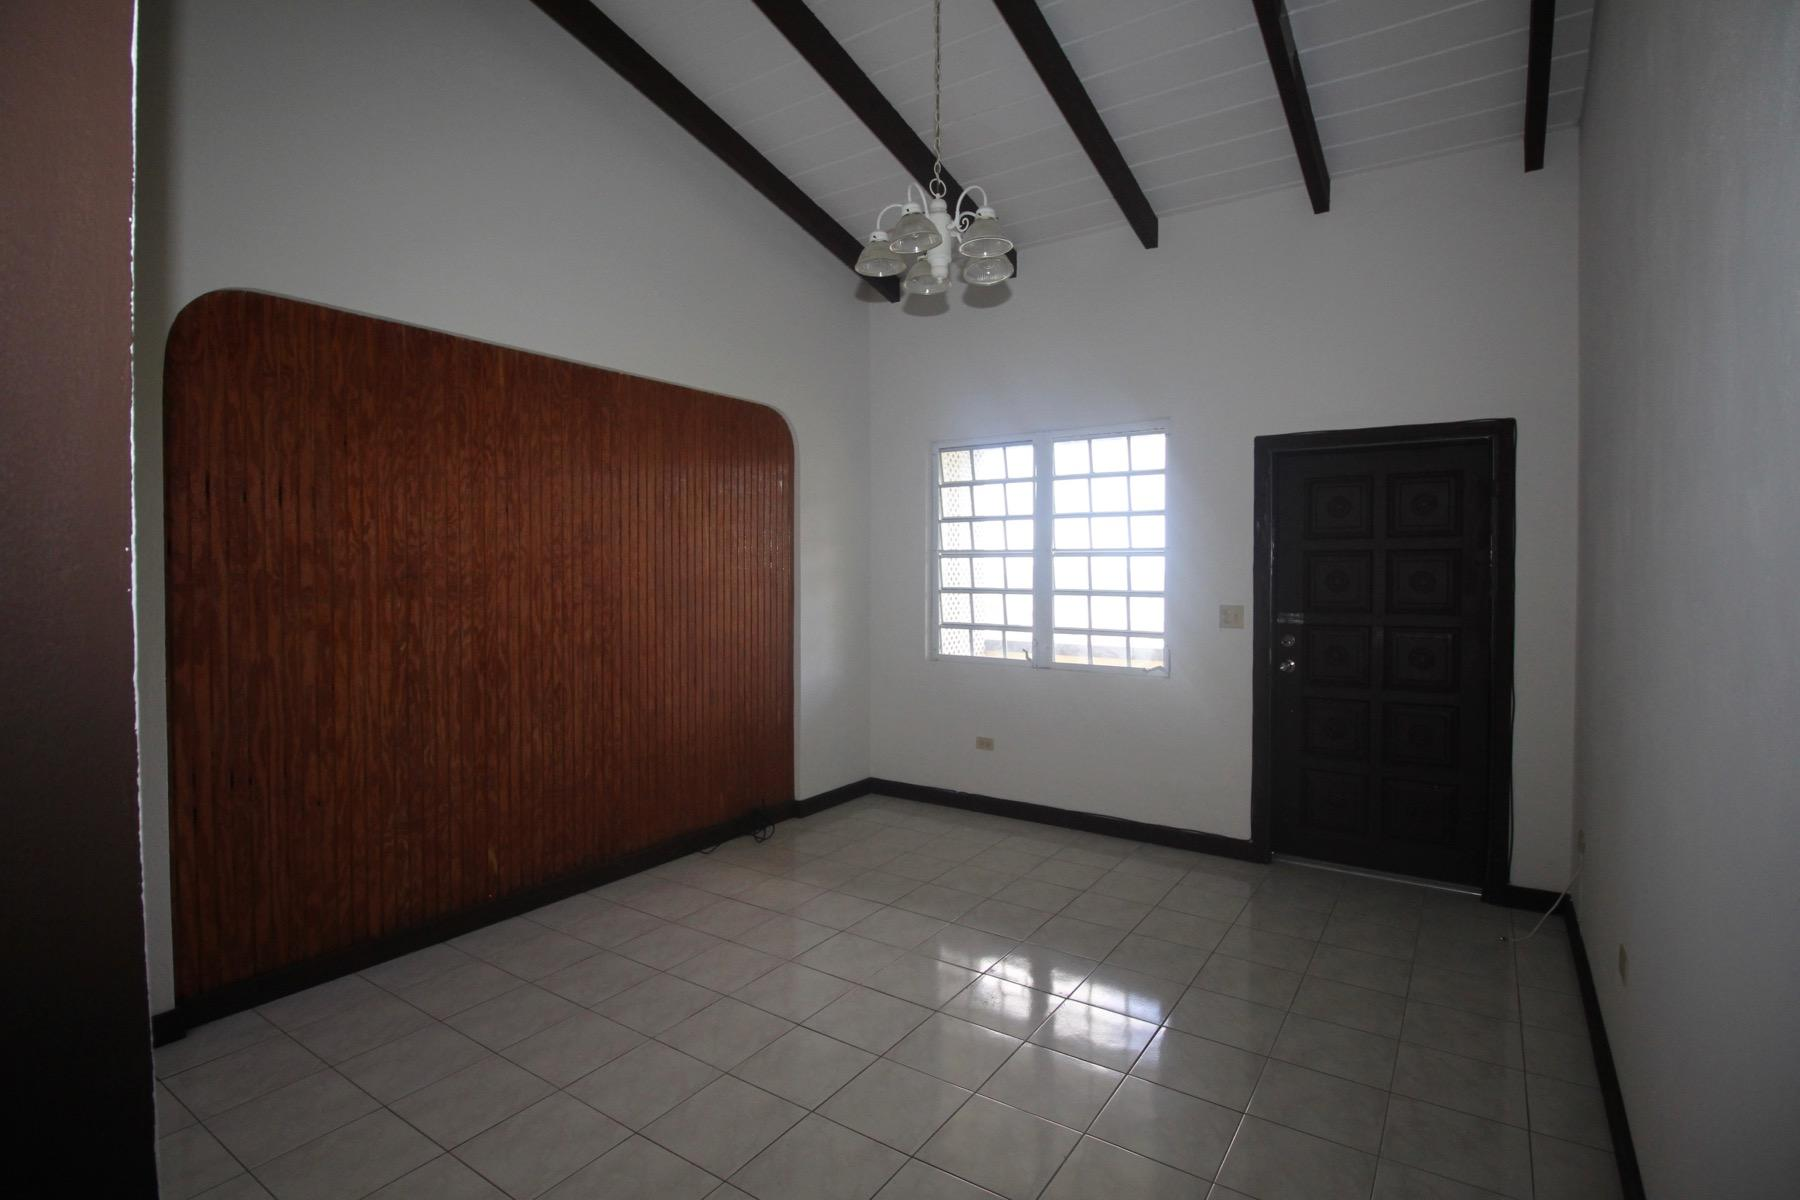 living room/entry